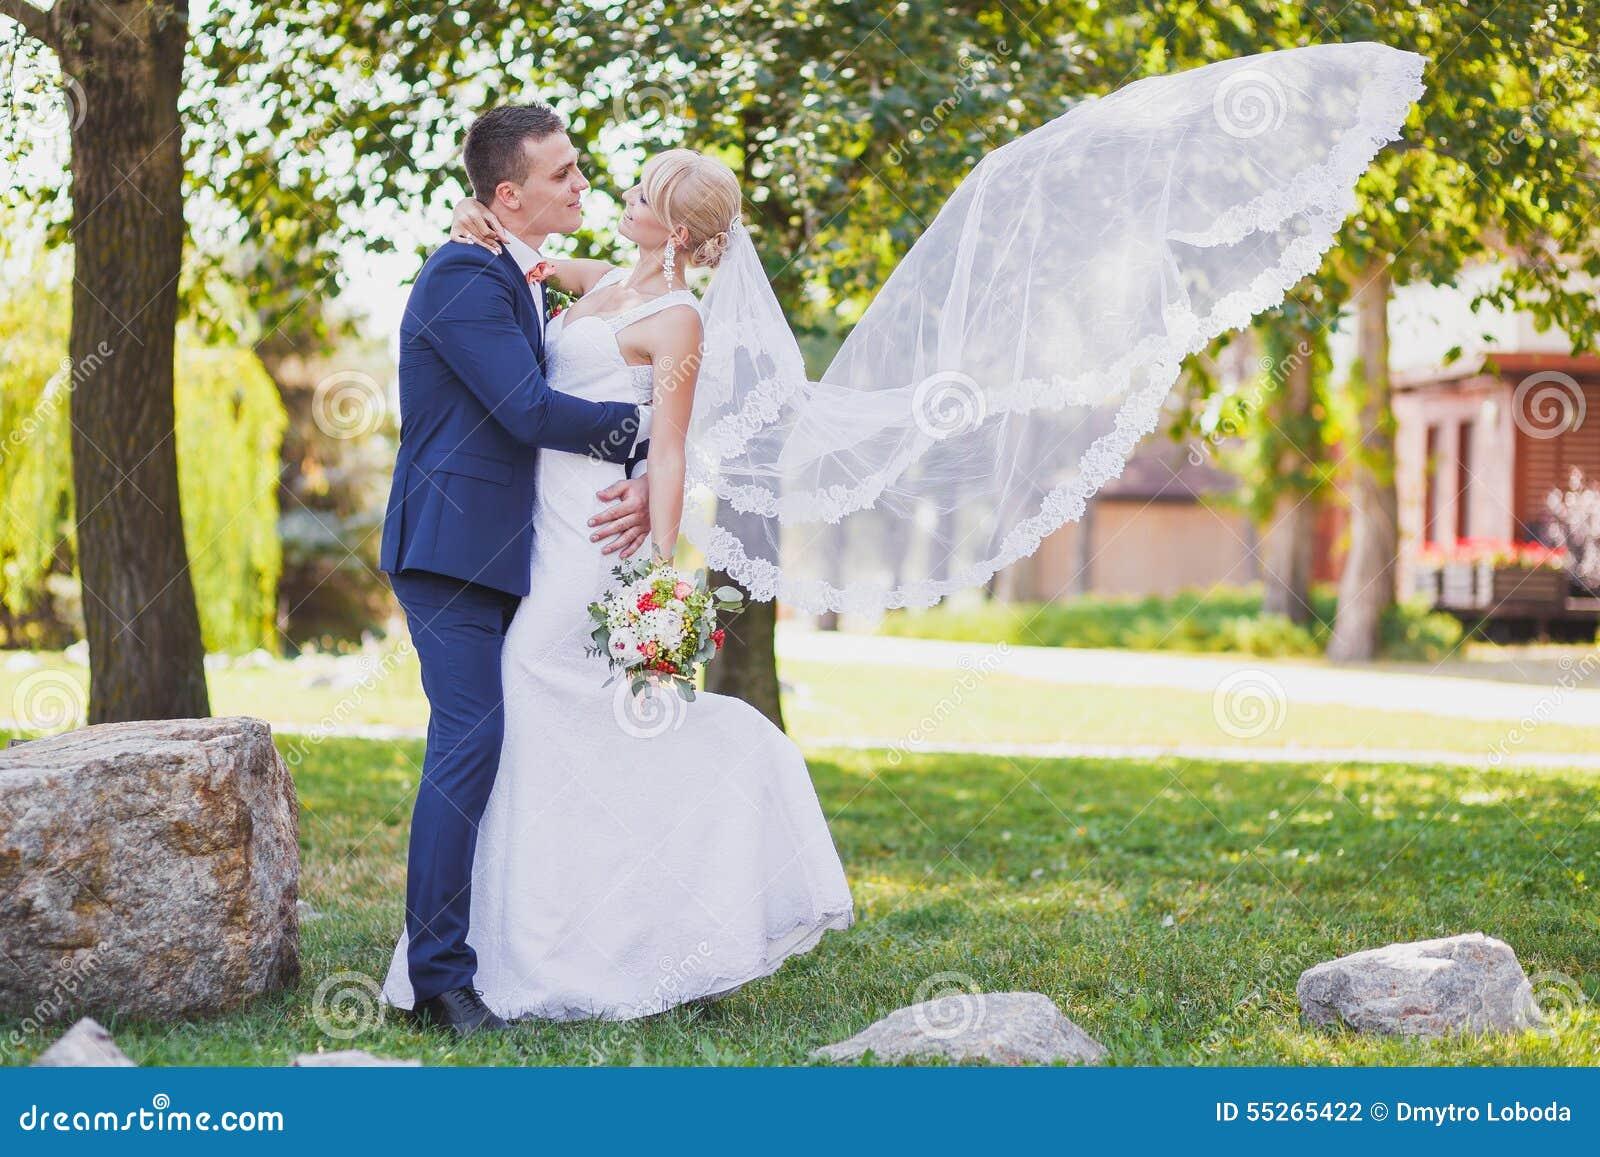 Groom Bride Bridal Veil Flying Stock Photo